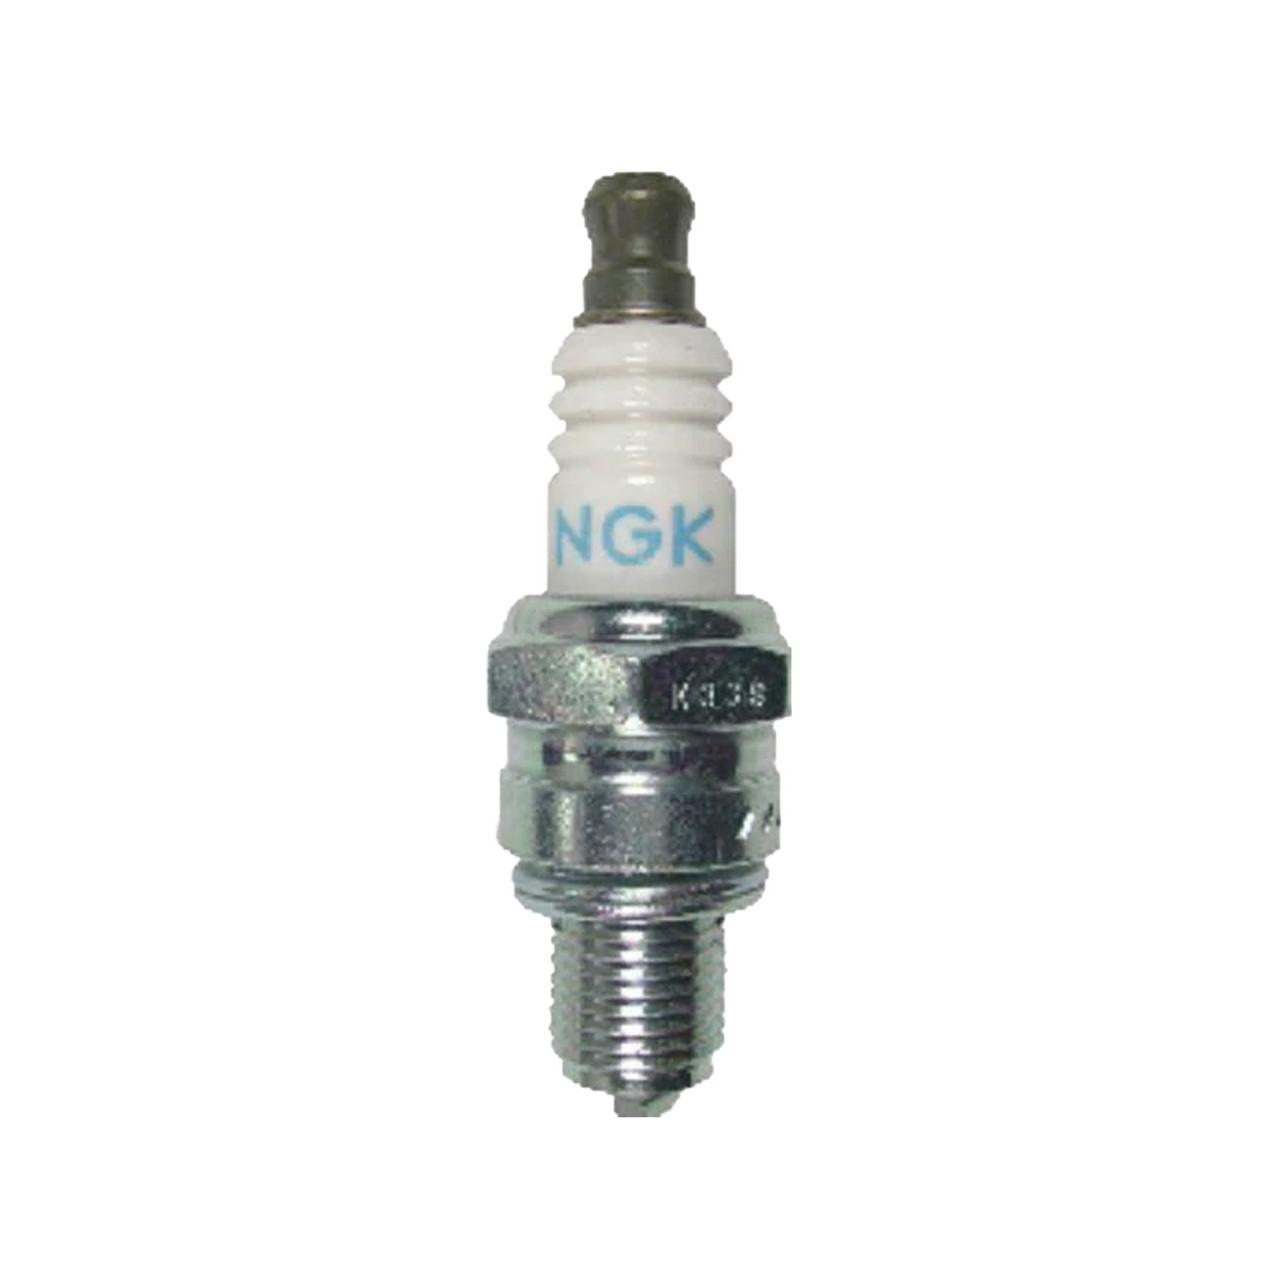 SHINDAIWA Spark Plug - Cmr7H A425000060 - Image 1